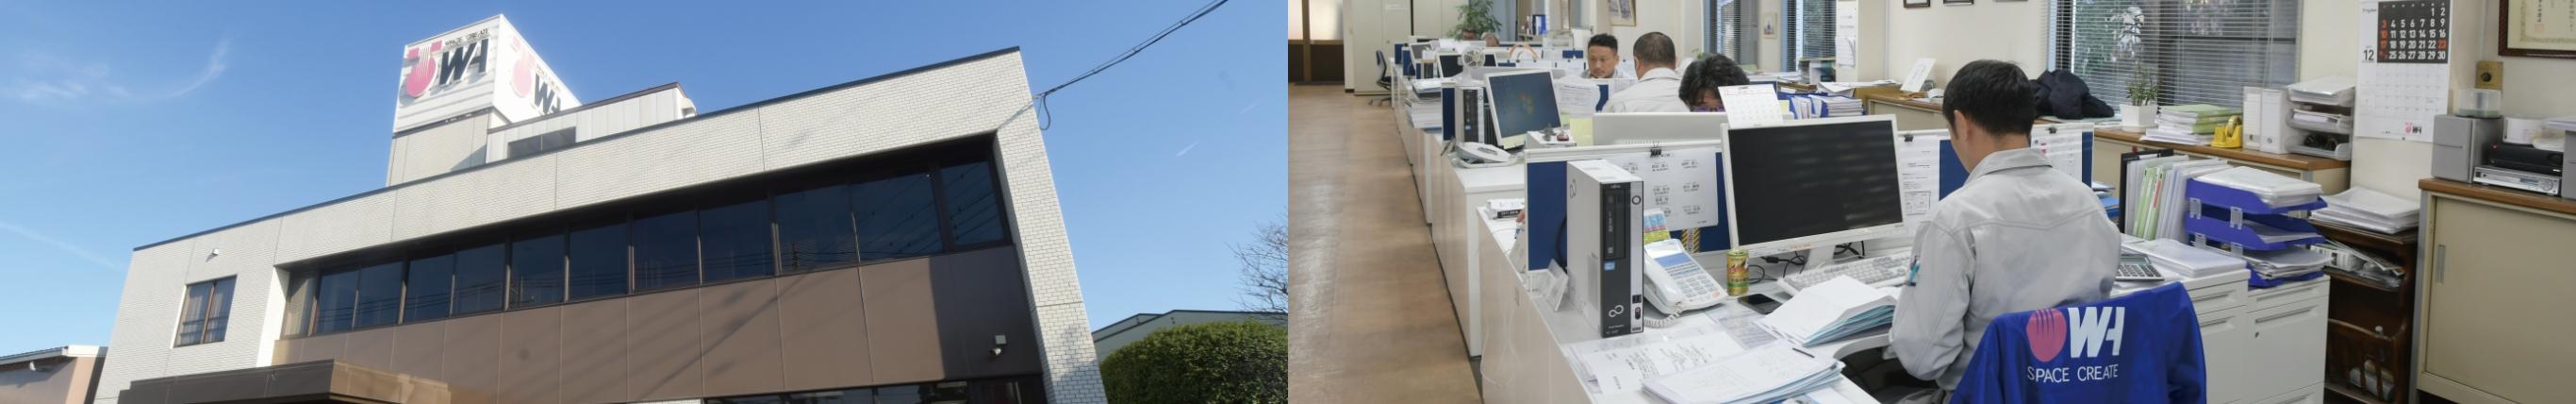 株式会社東和の社屋